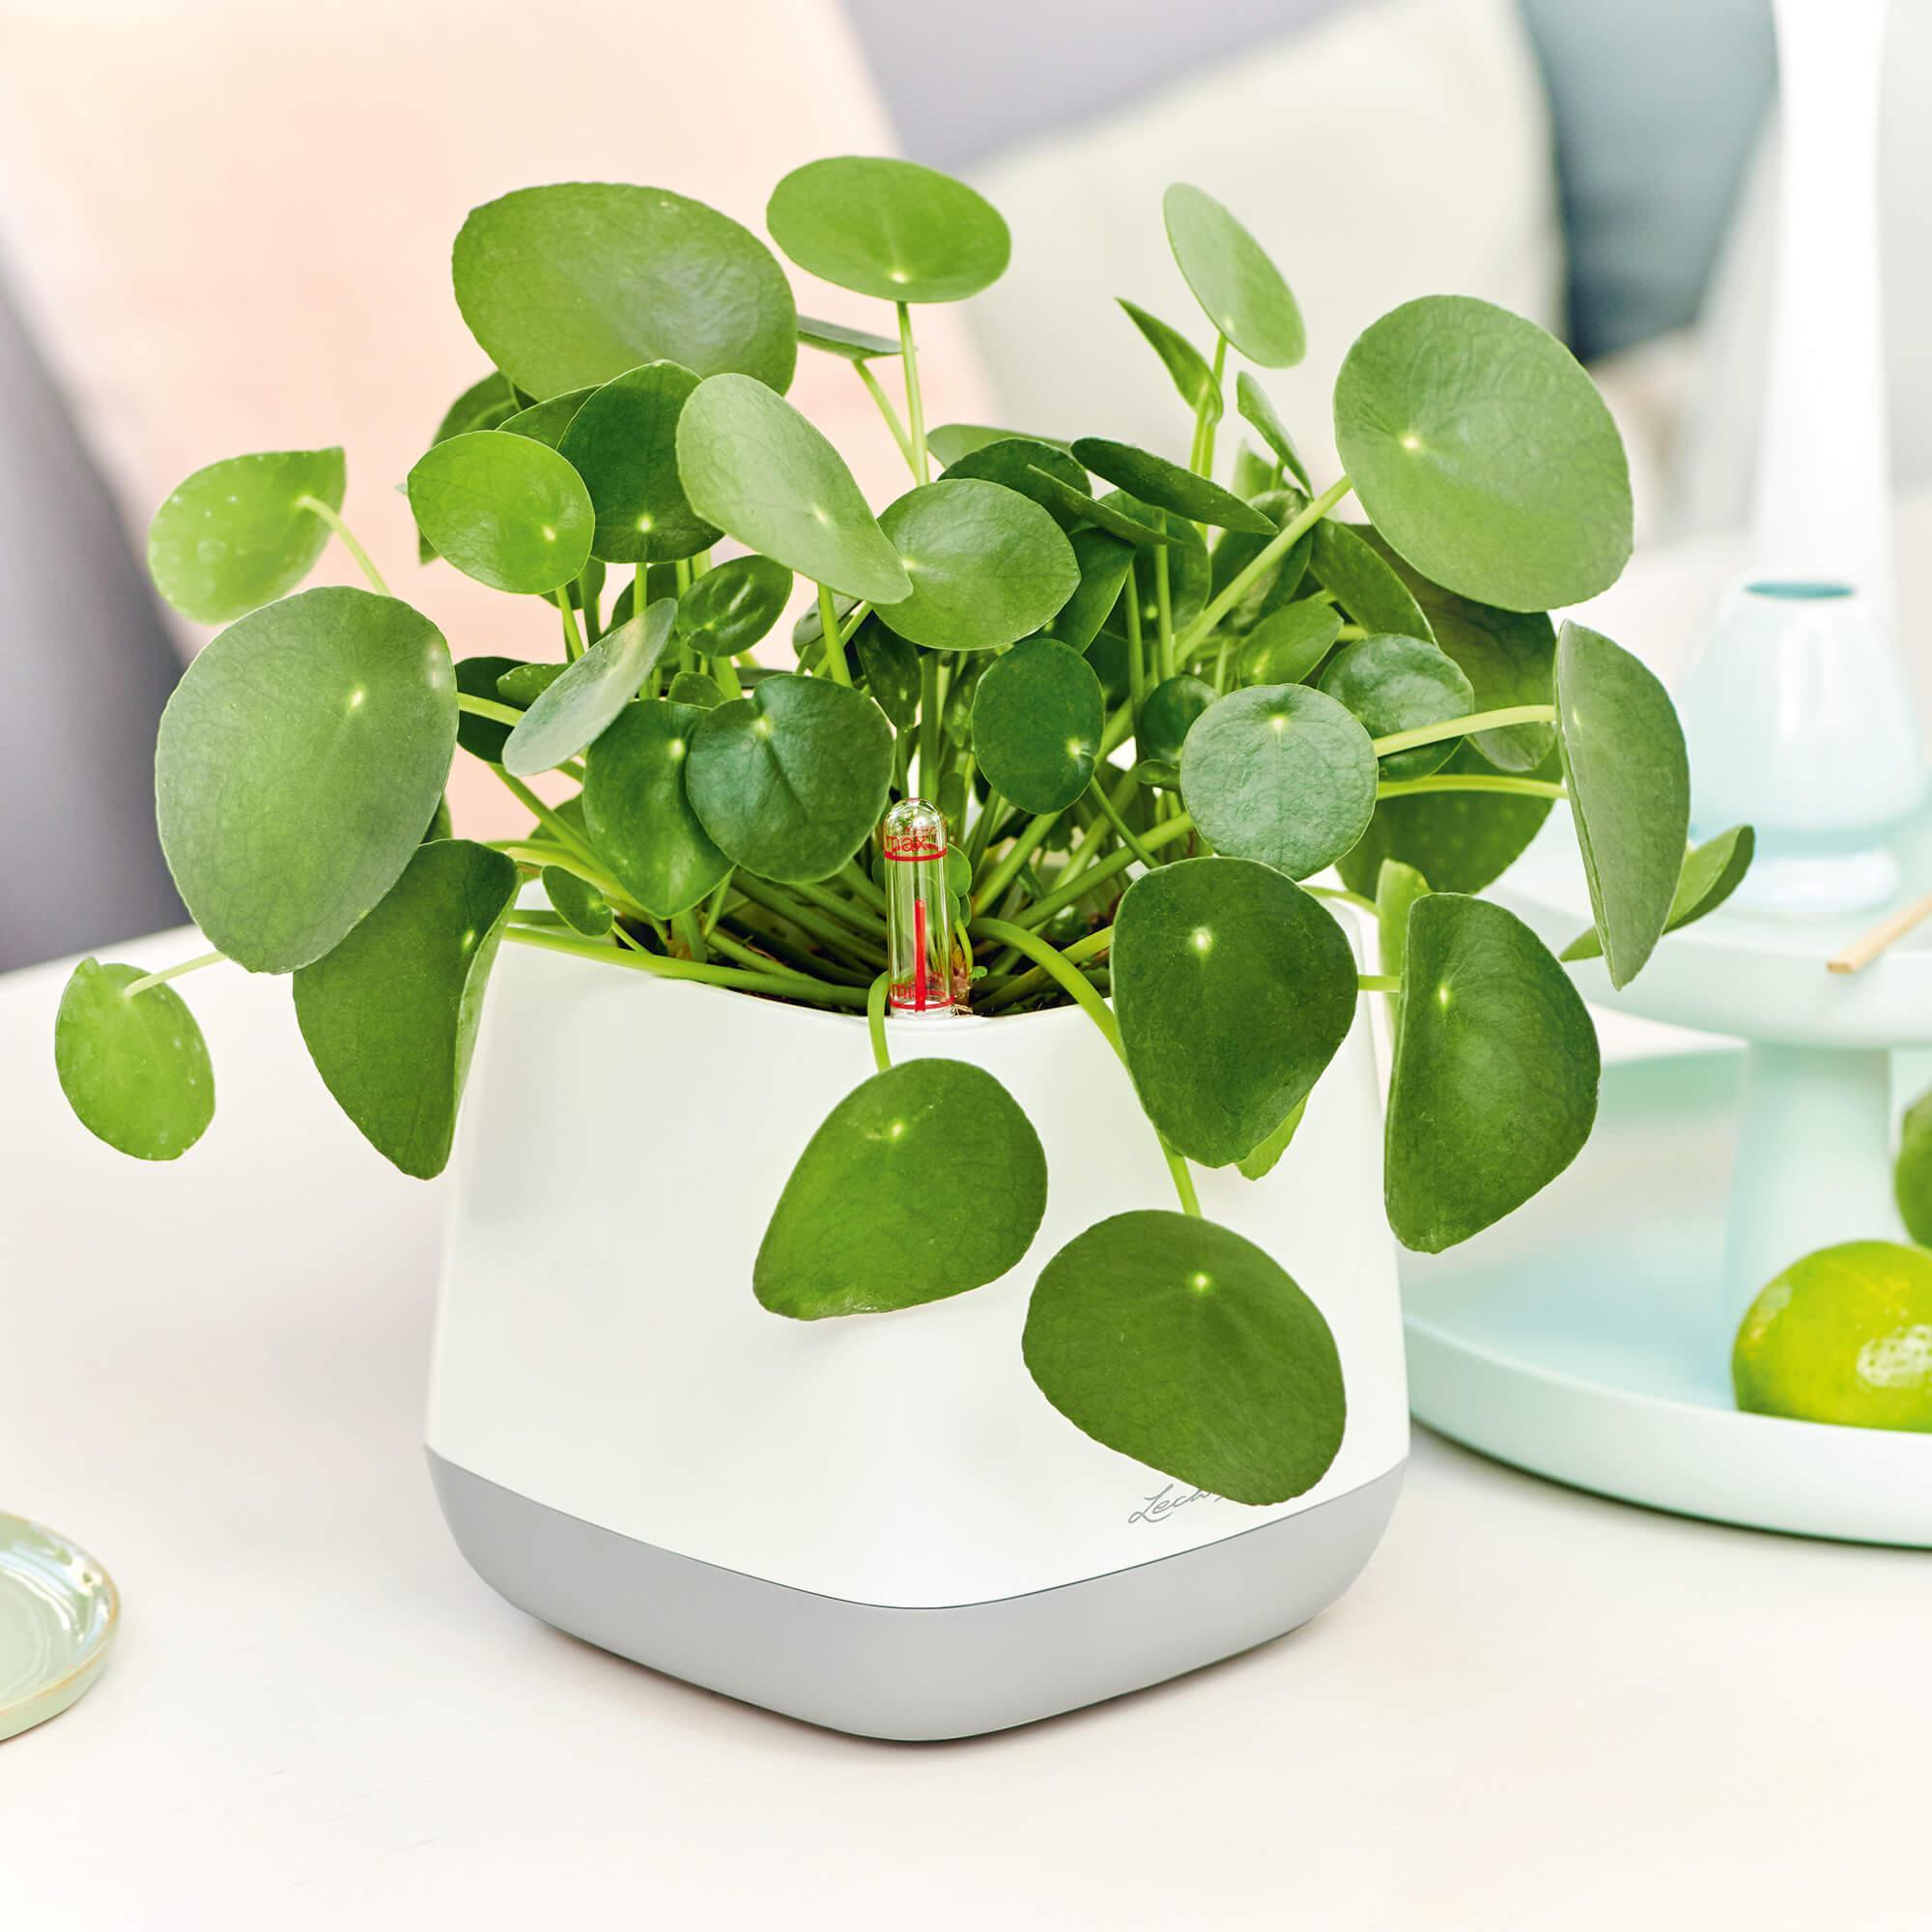 YULA planter white/gray semi-gloss - Image 6